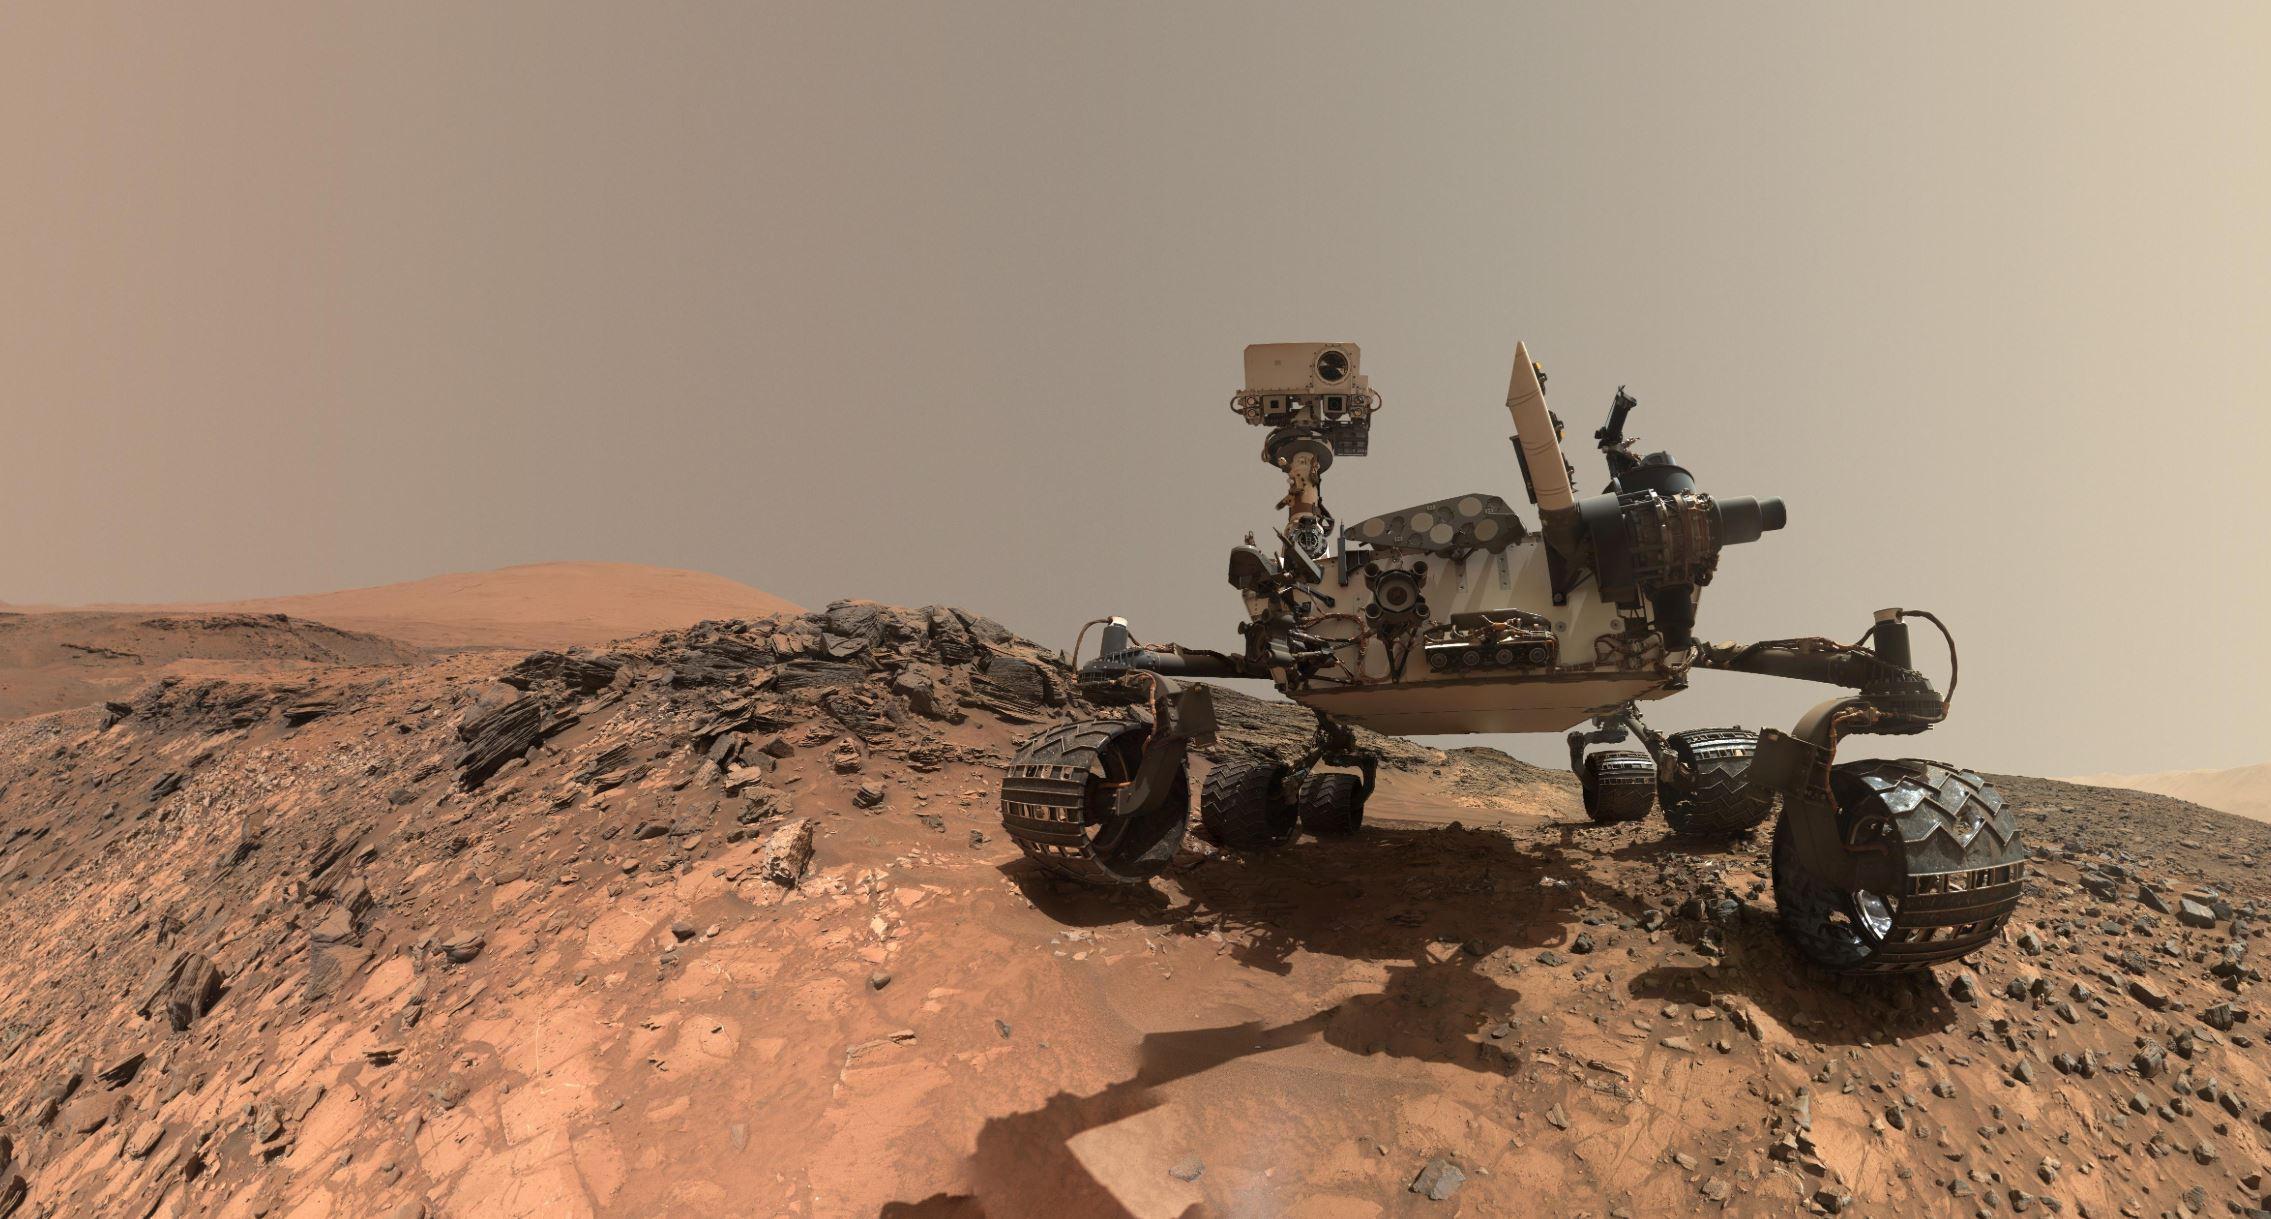 Image credits: NASA/JPL-Caltech/MSSS